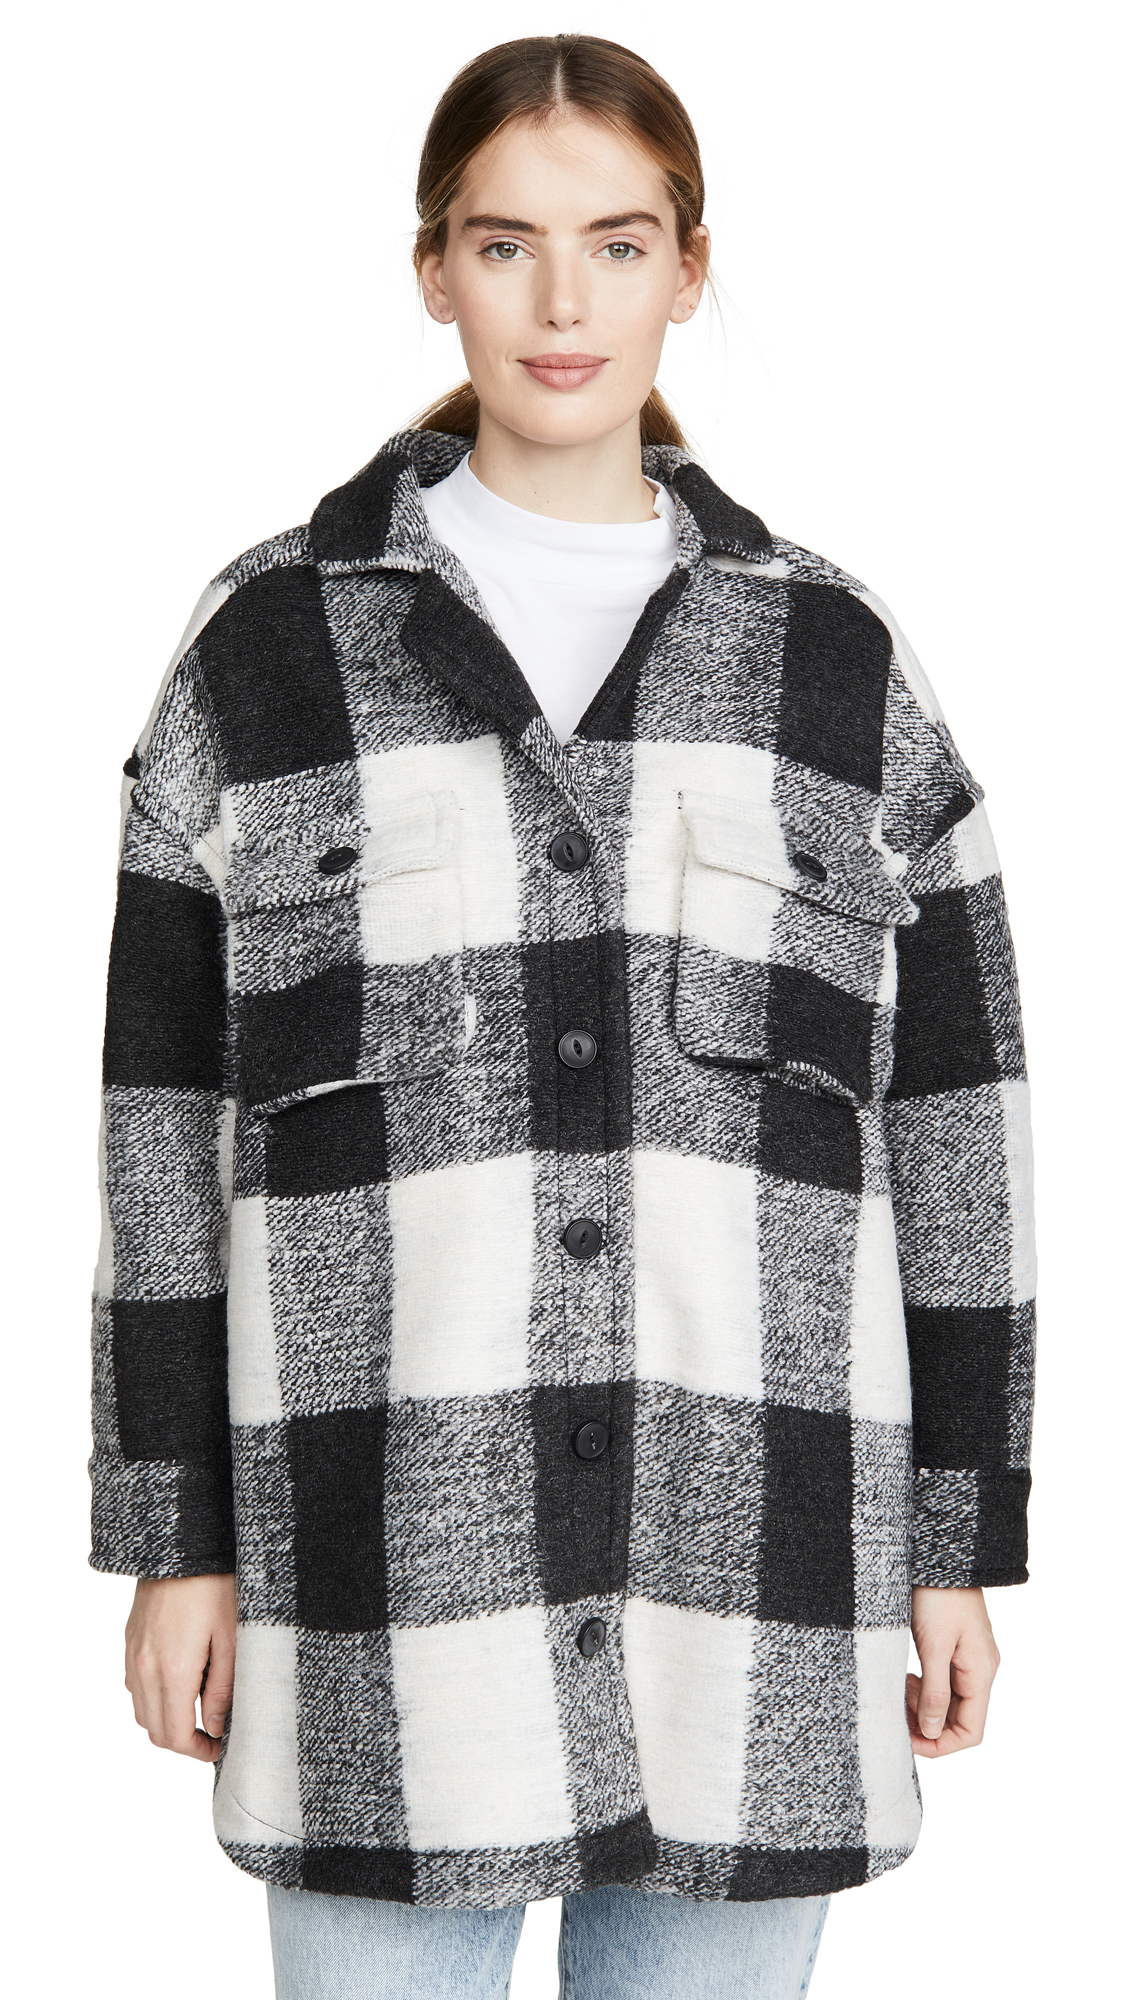 Buy ANINE BING Mave Jacket online beautiful ANINE BING Jackets, Coats, Coats